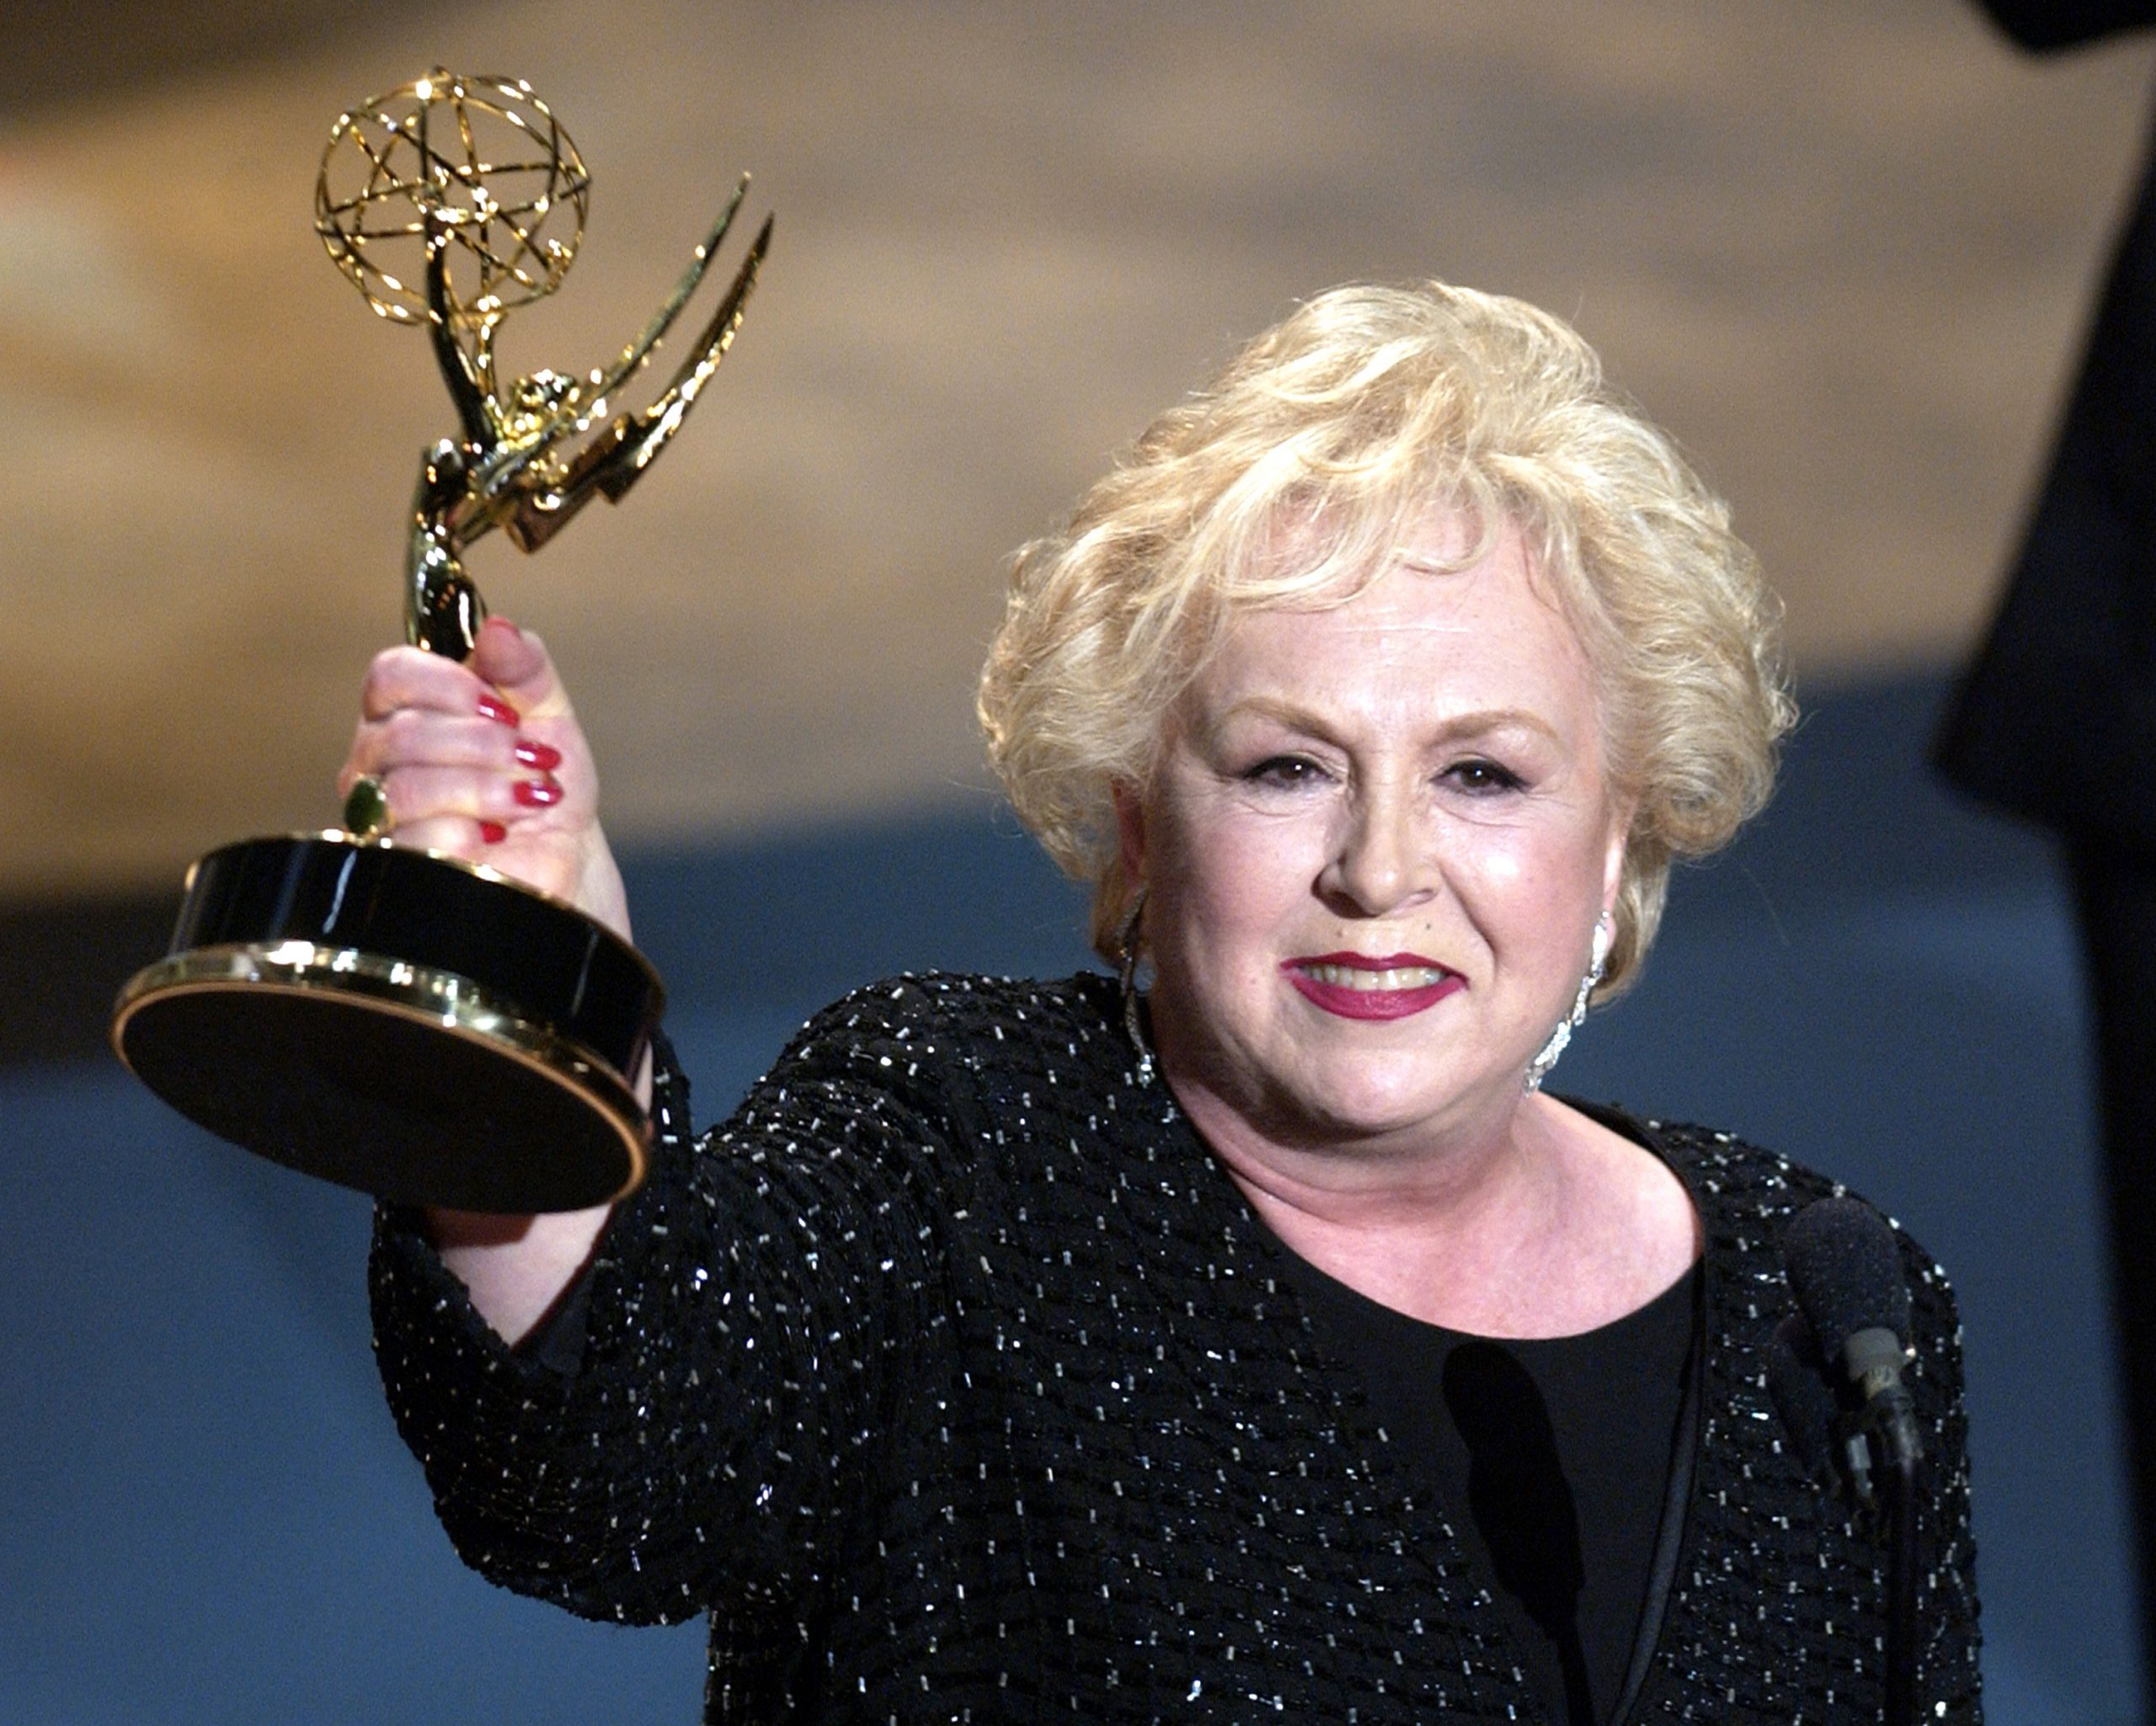 'Everybody Loves Raymond' star Doris Roberts with her 2001 Emmy win